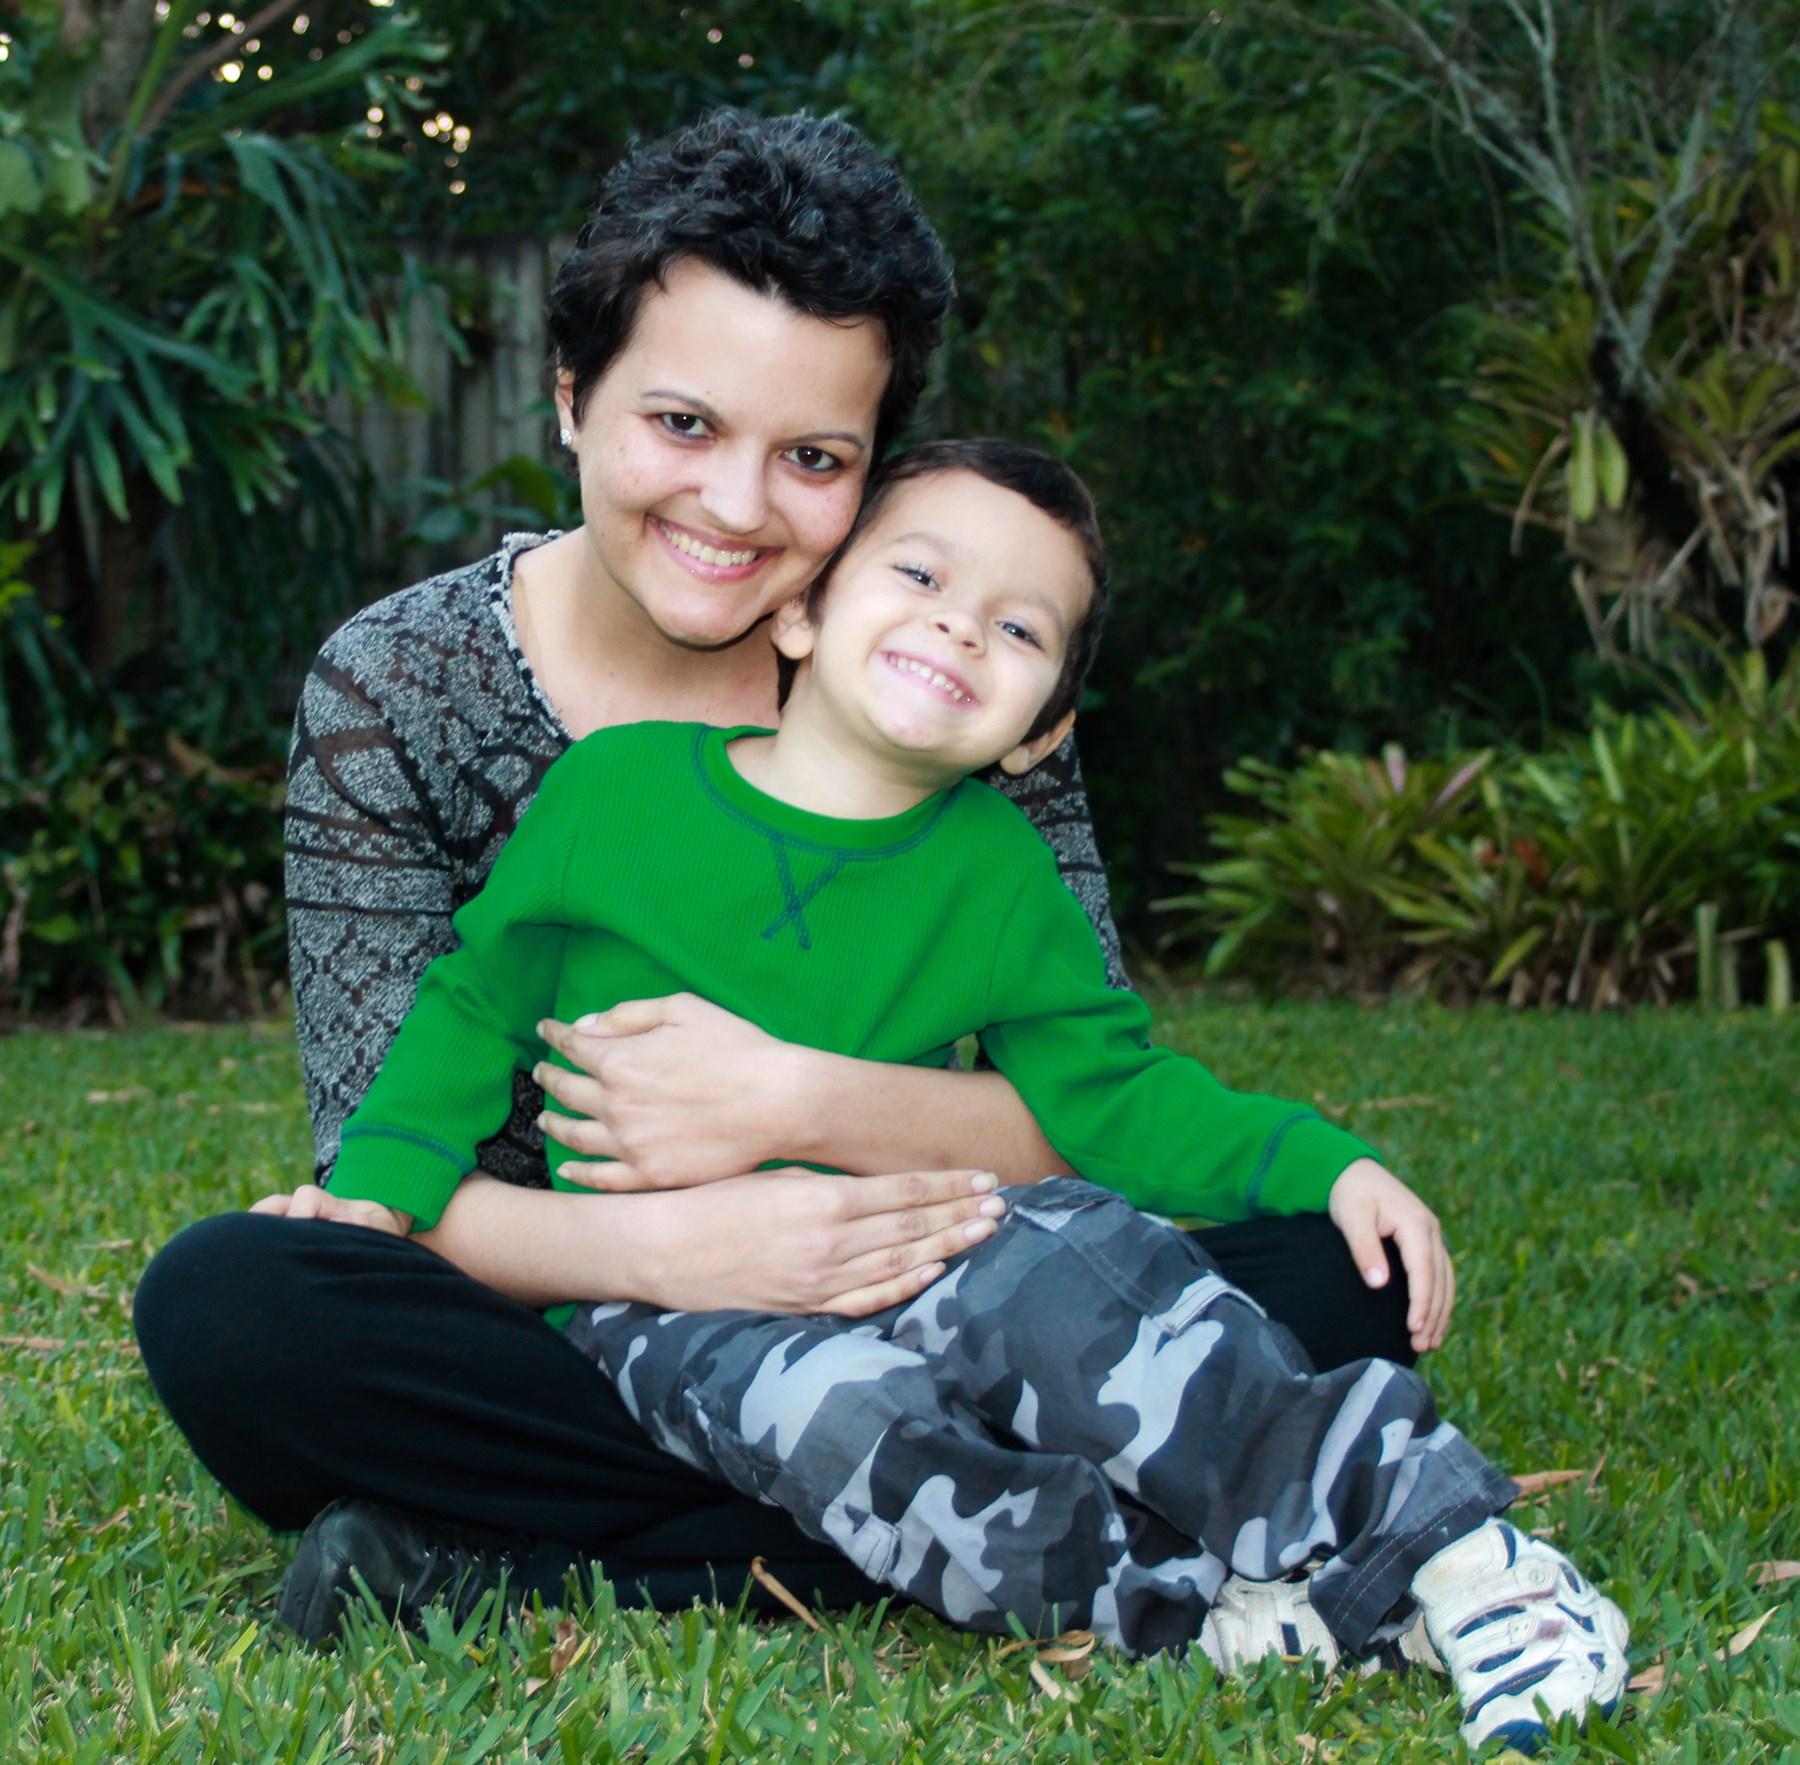 Natalie D. Hernandez Obituary - Lake Worth, FL